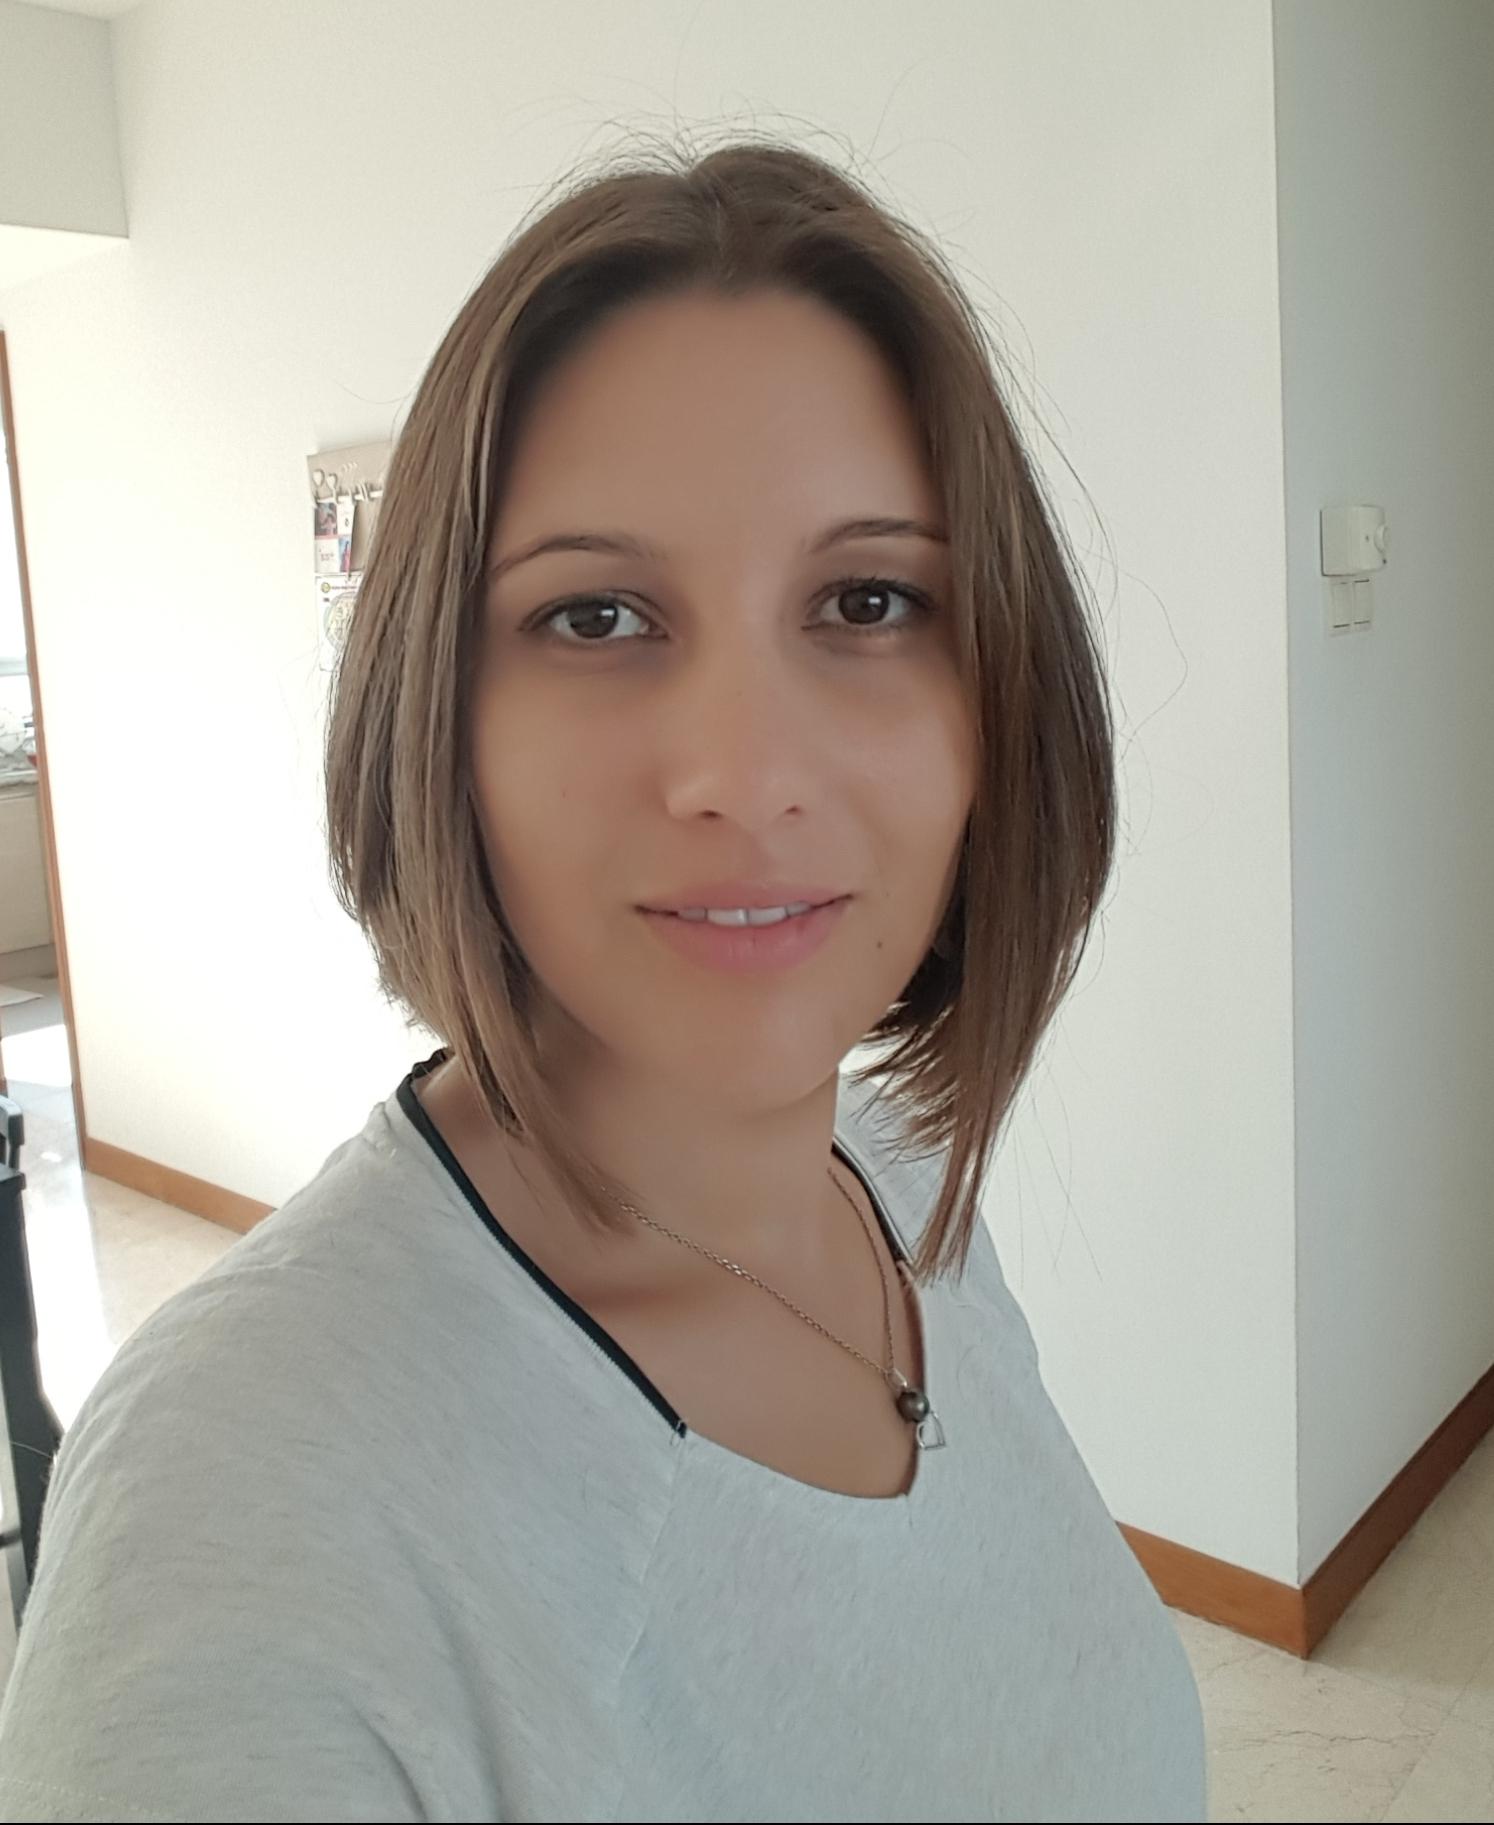 Elisa Labourie